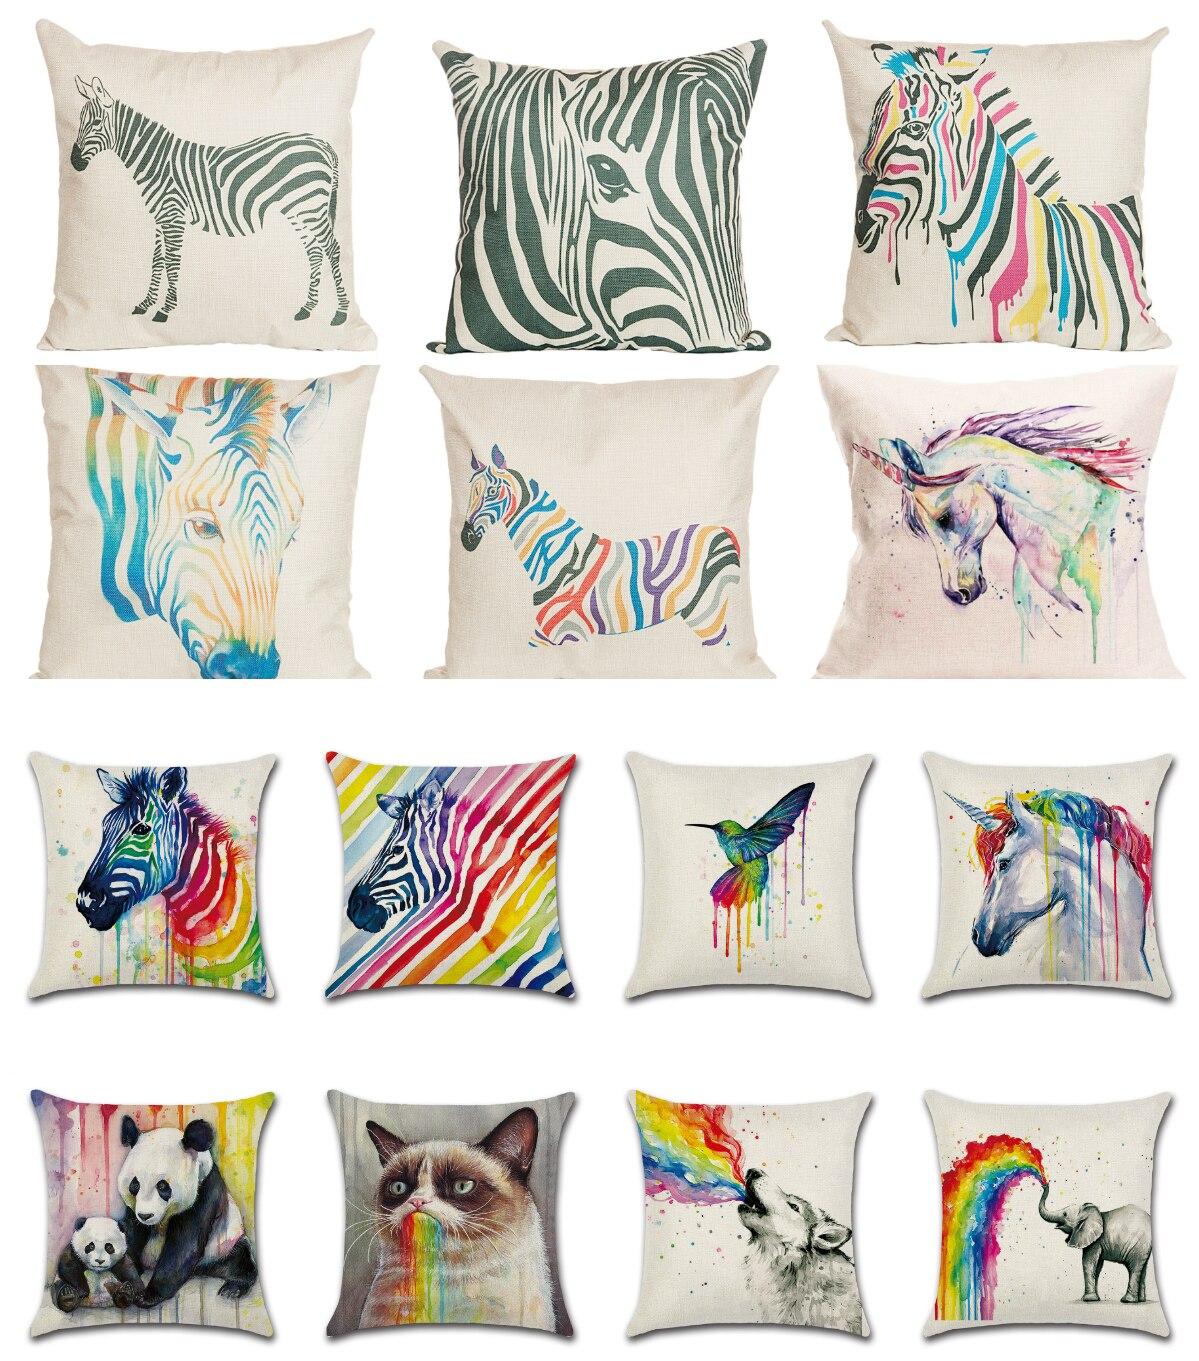 Nuevos animales calientes cebra unicornio elefante Lobo funda para almohada con aves Lino Premium tiro fundas decorativas para almohadas hogar sofá Navidad